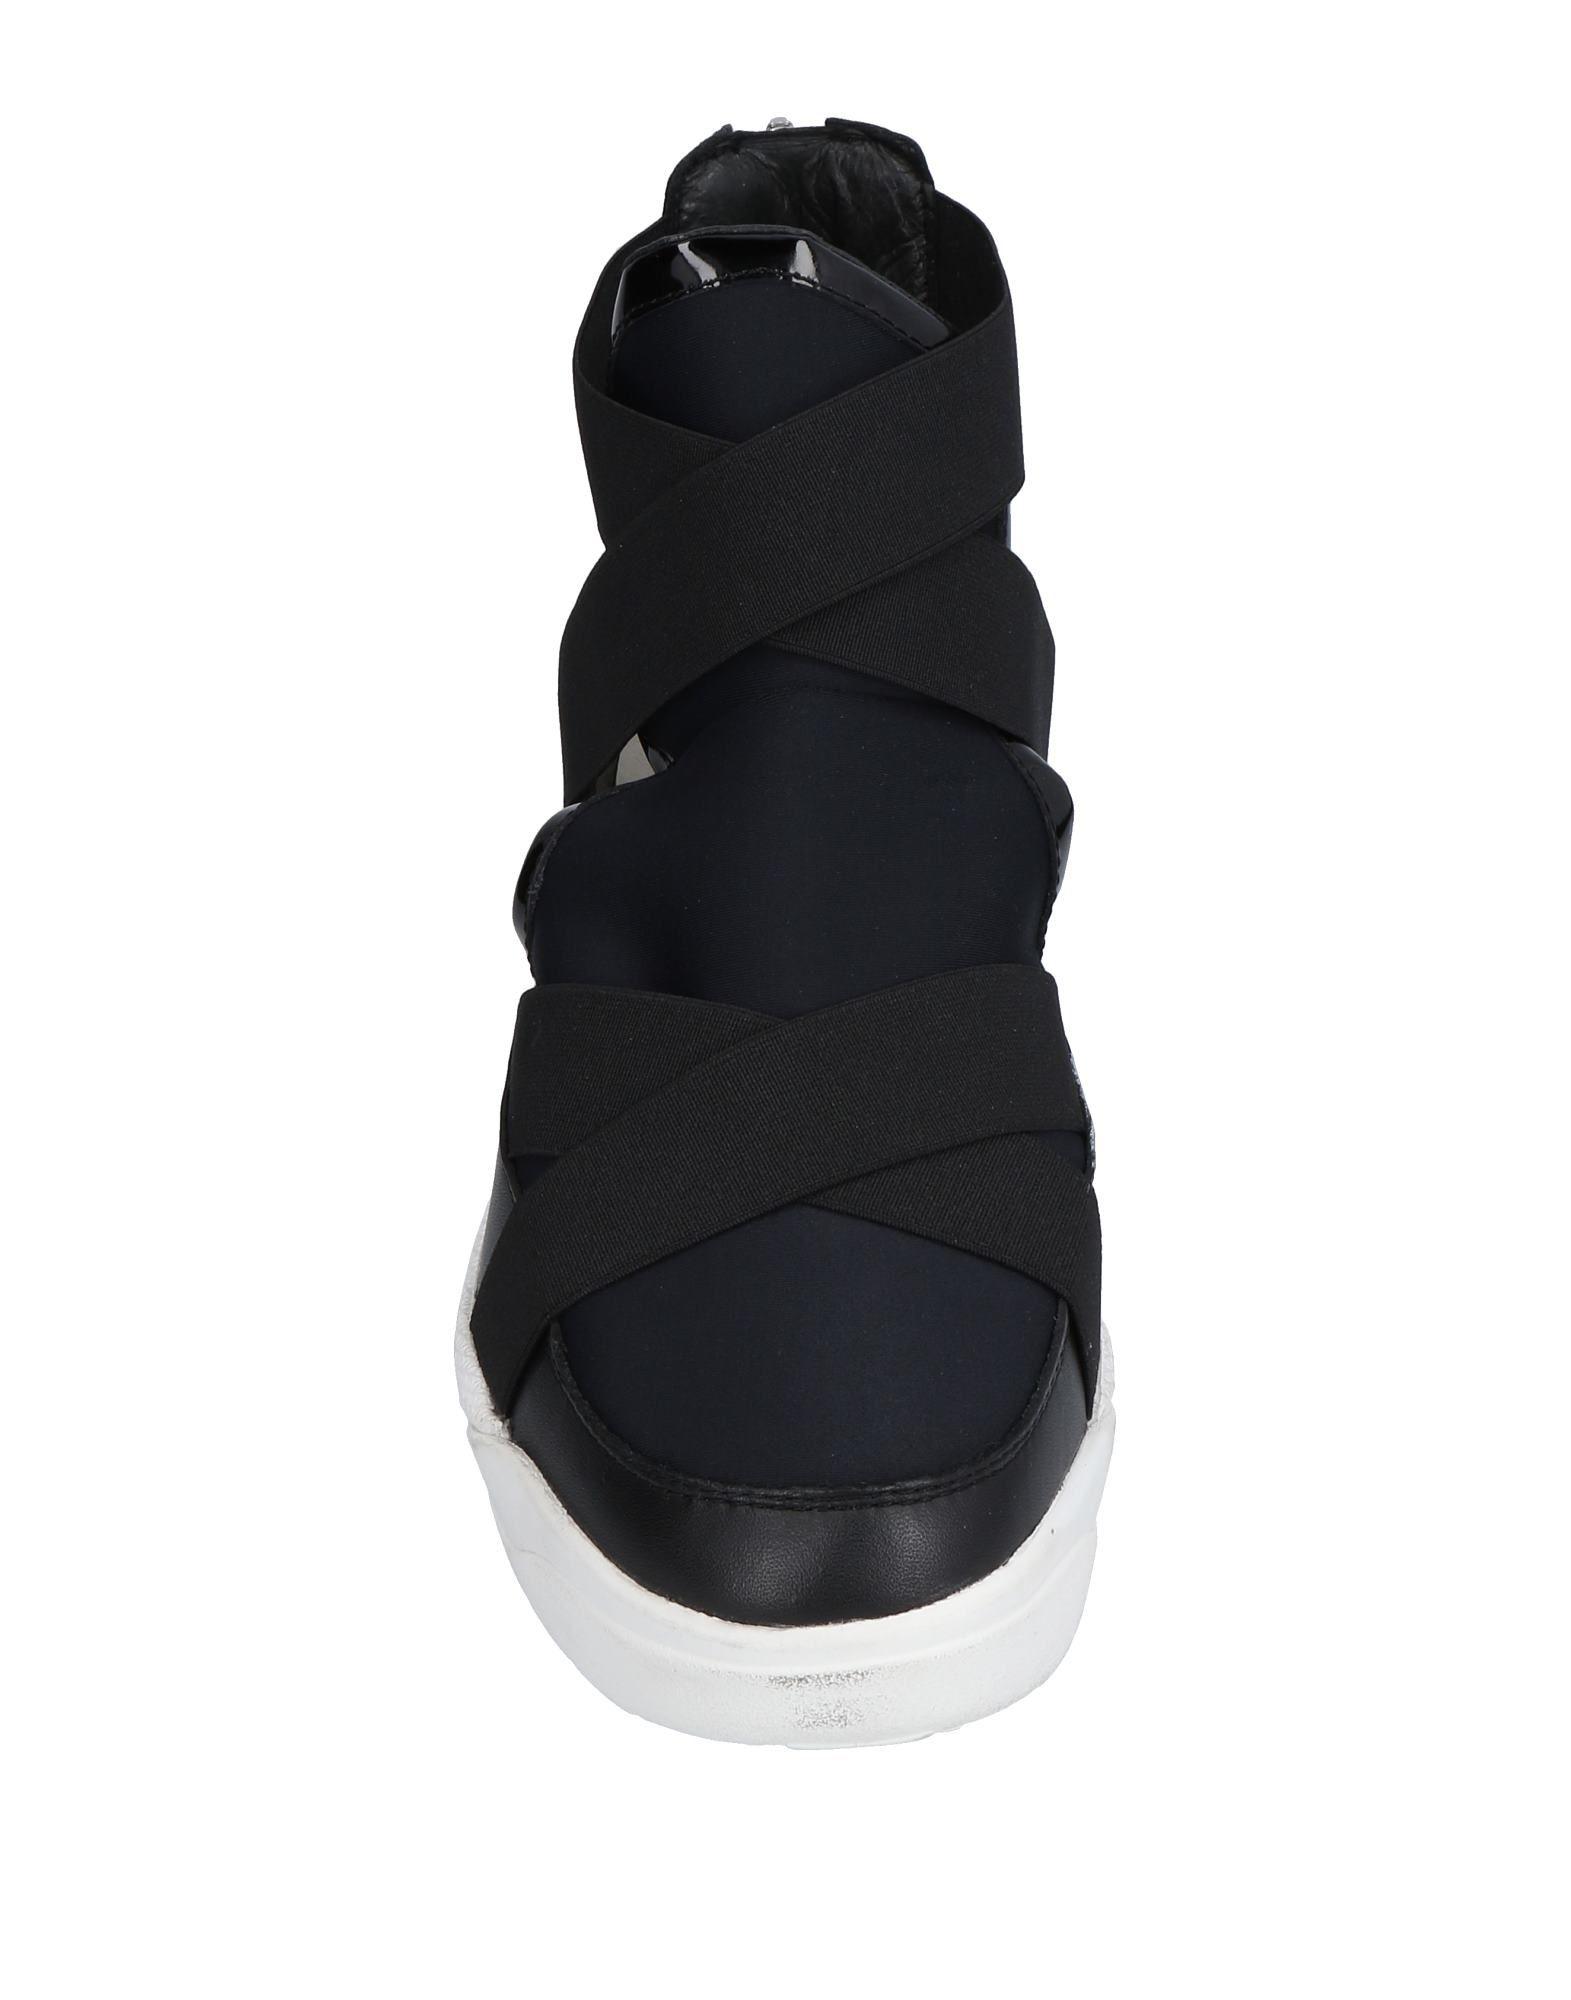 Rabatt echte Schuhe Crime London 11507888WL Sneakers Herren  11507888WL London a3c7de